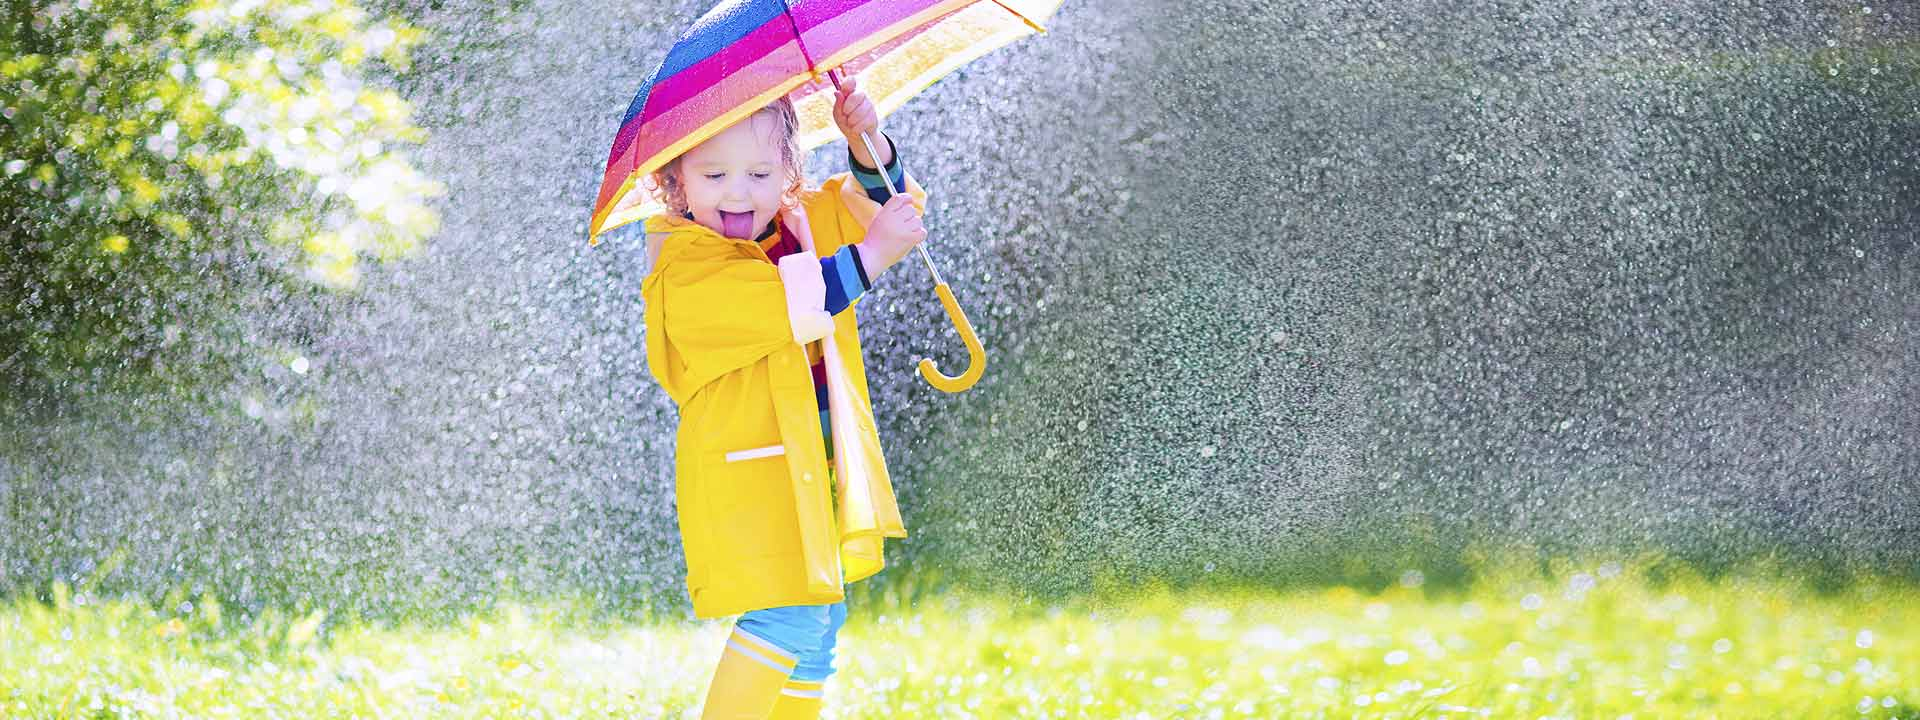 Things To Do In Panama City Beach When It Rains Rainy